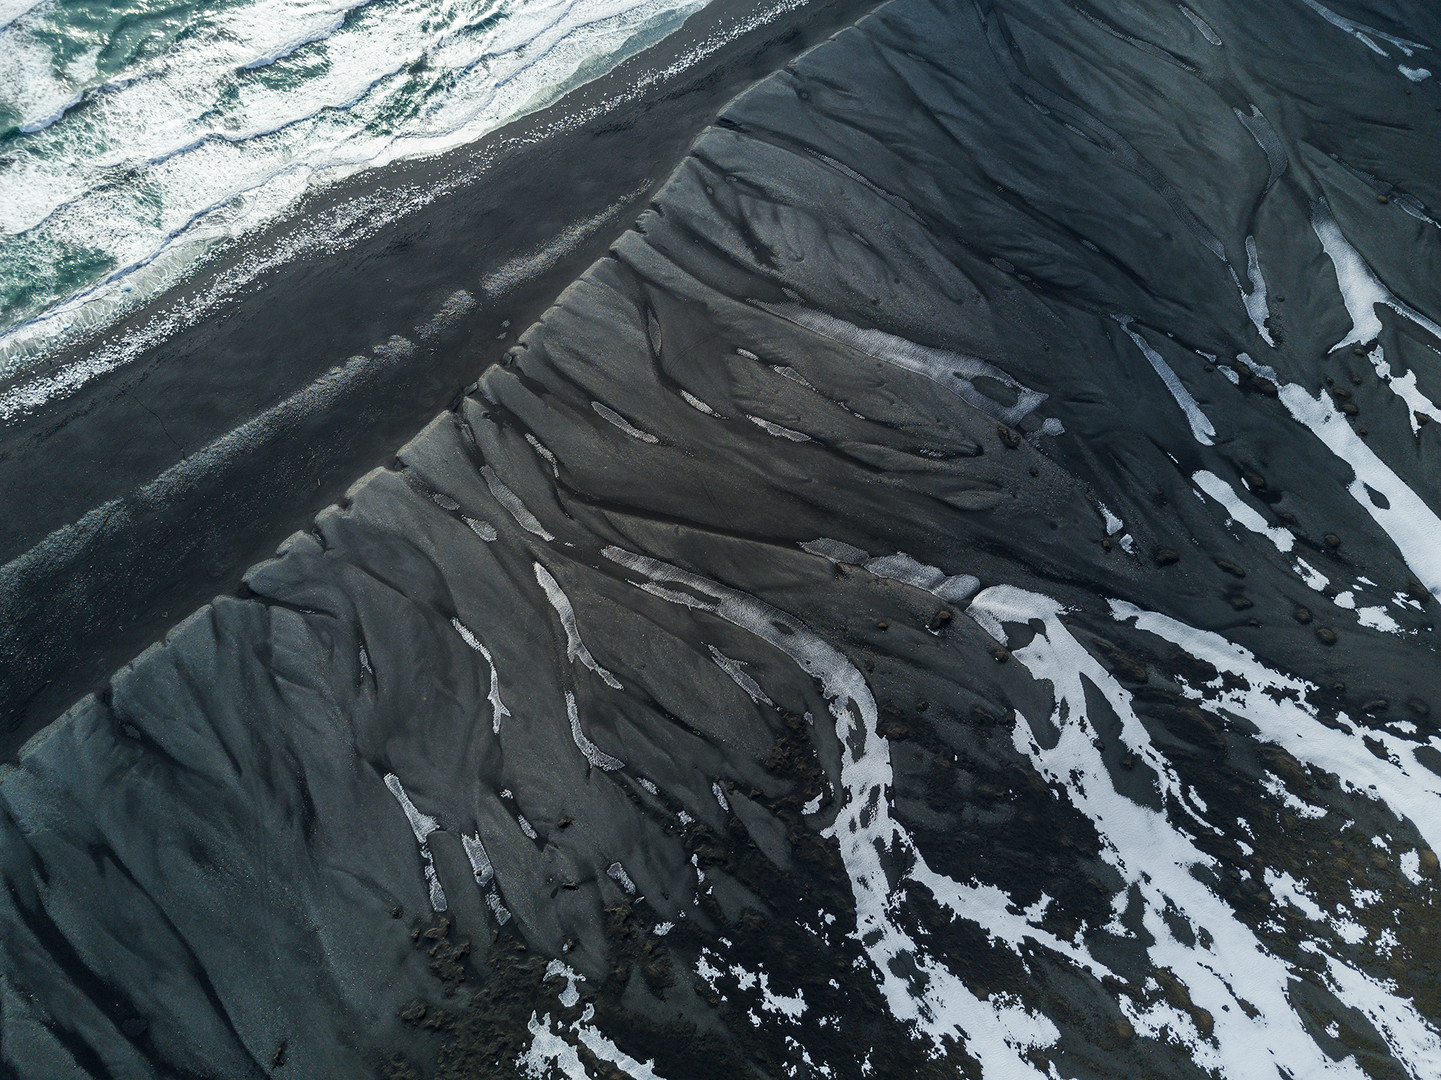 Islanda duna nera e mare.jpg